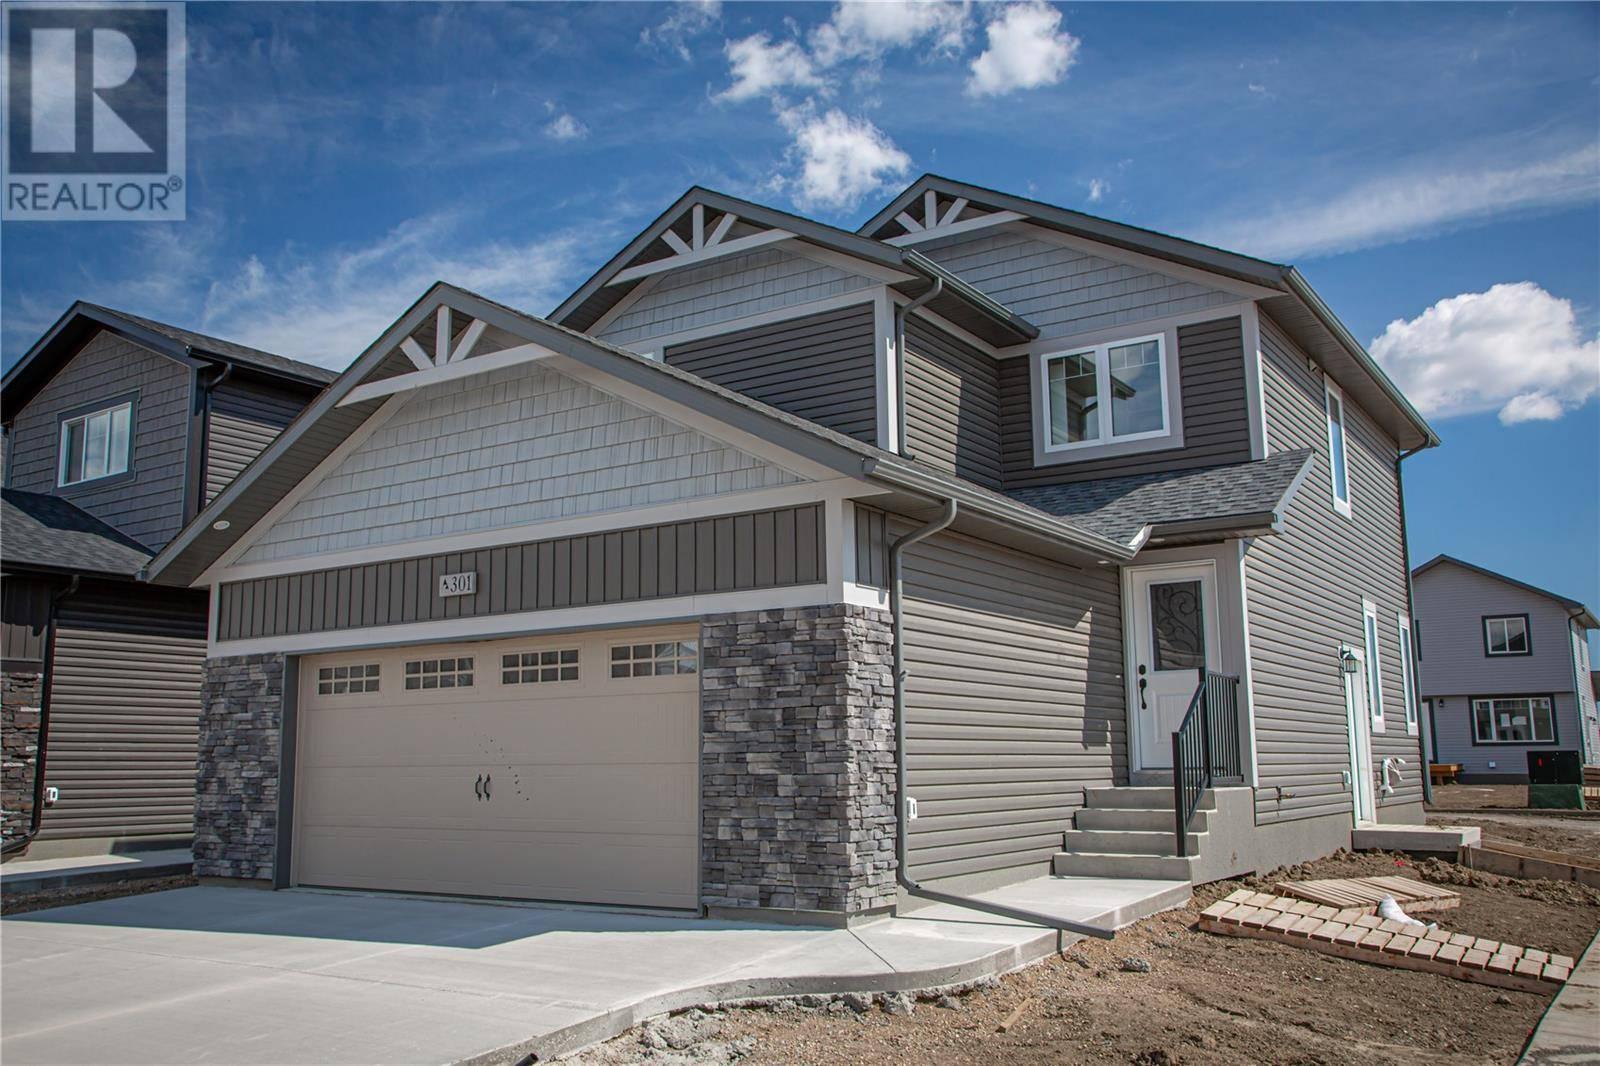 House for sale at 591 Mcfaull Cres Saskatoon Saskatchewan - MLS: SK789045